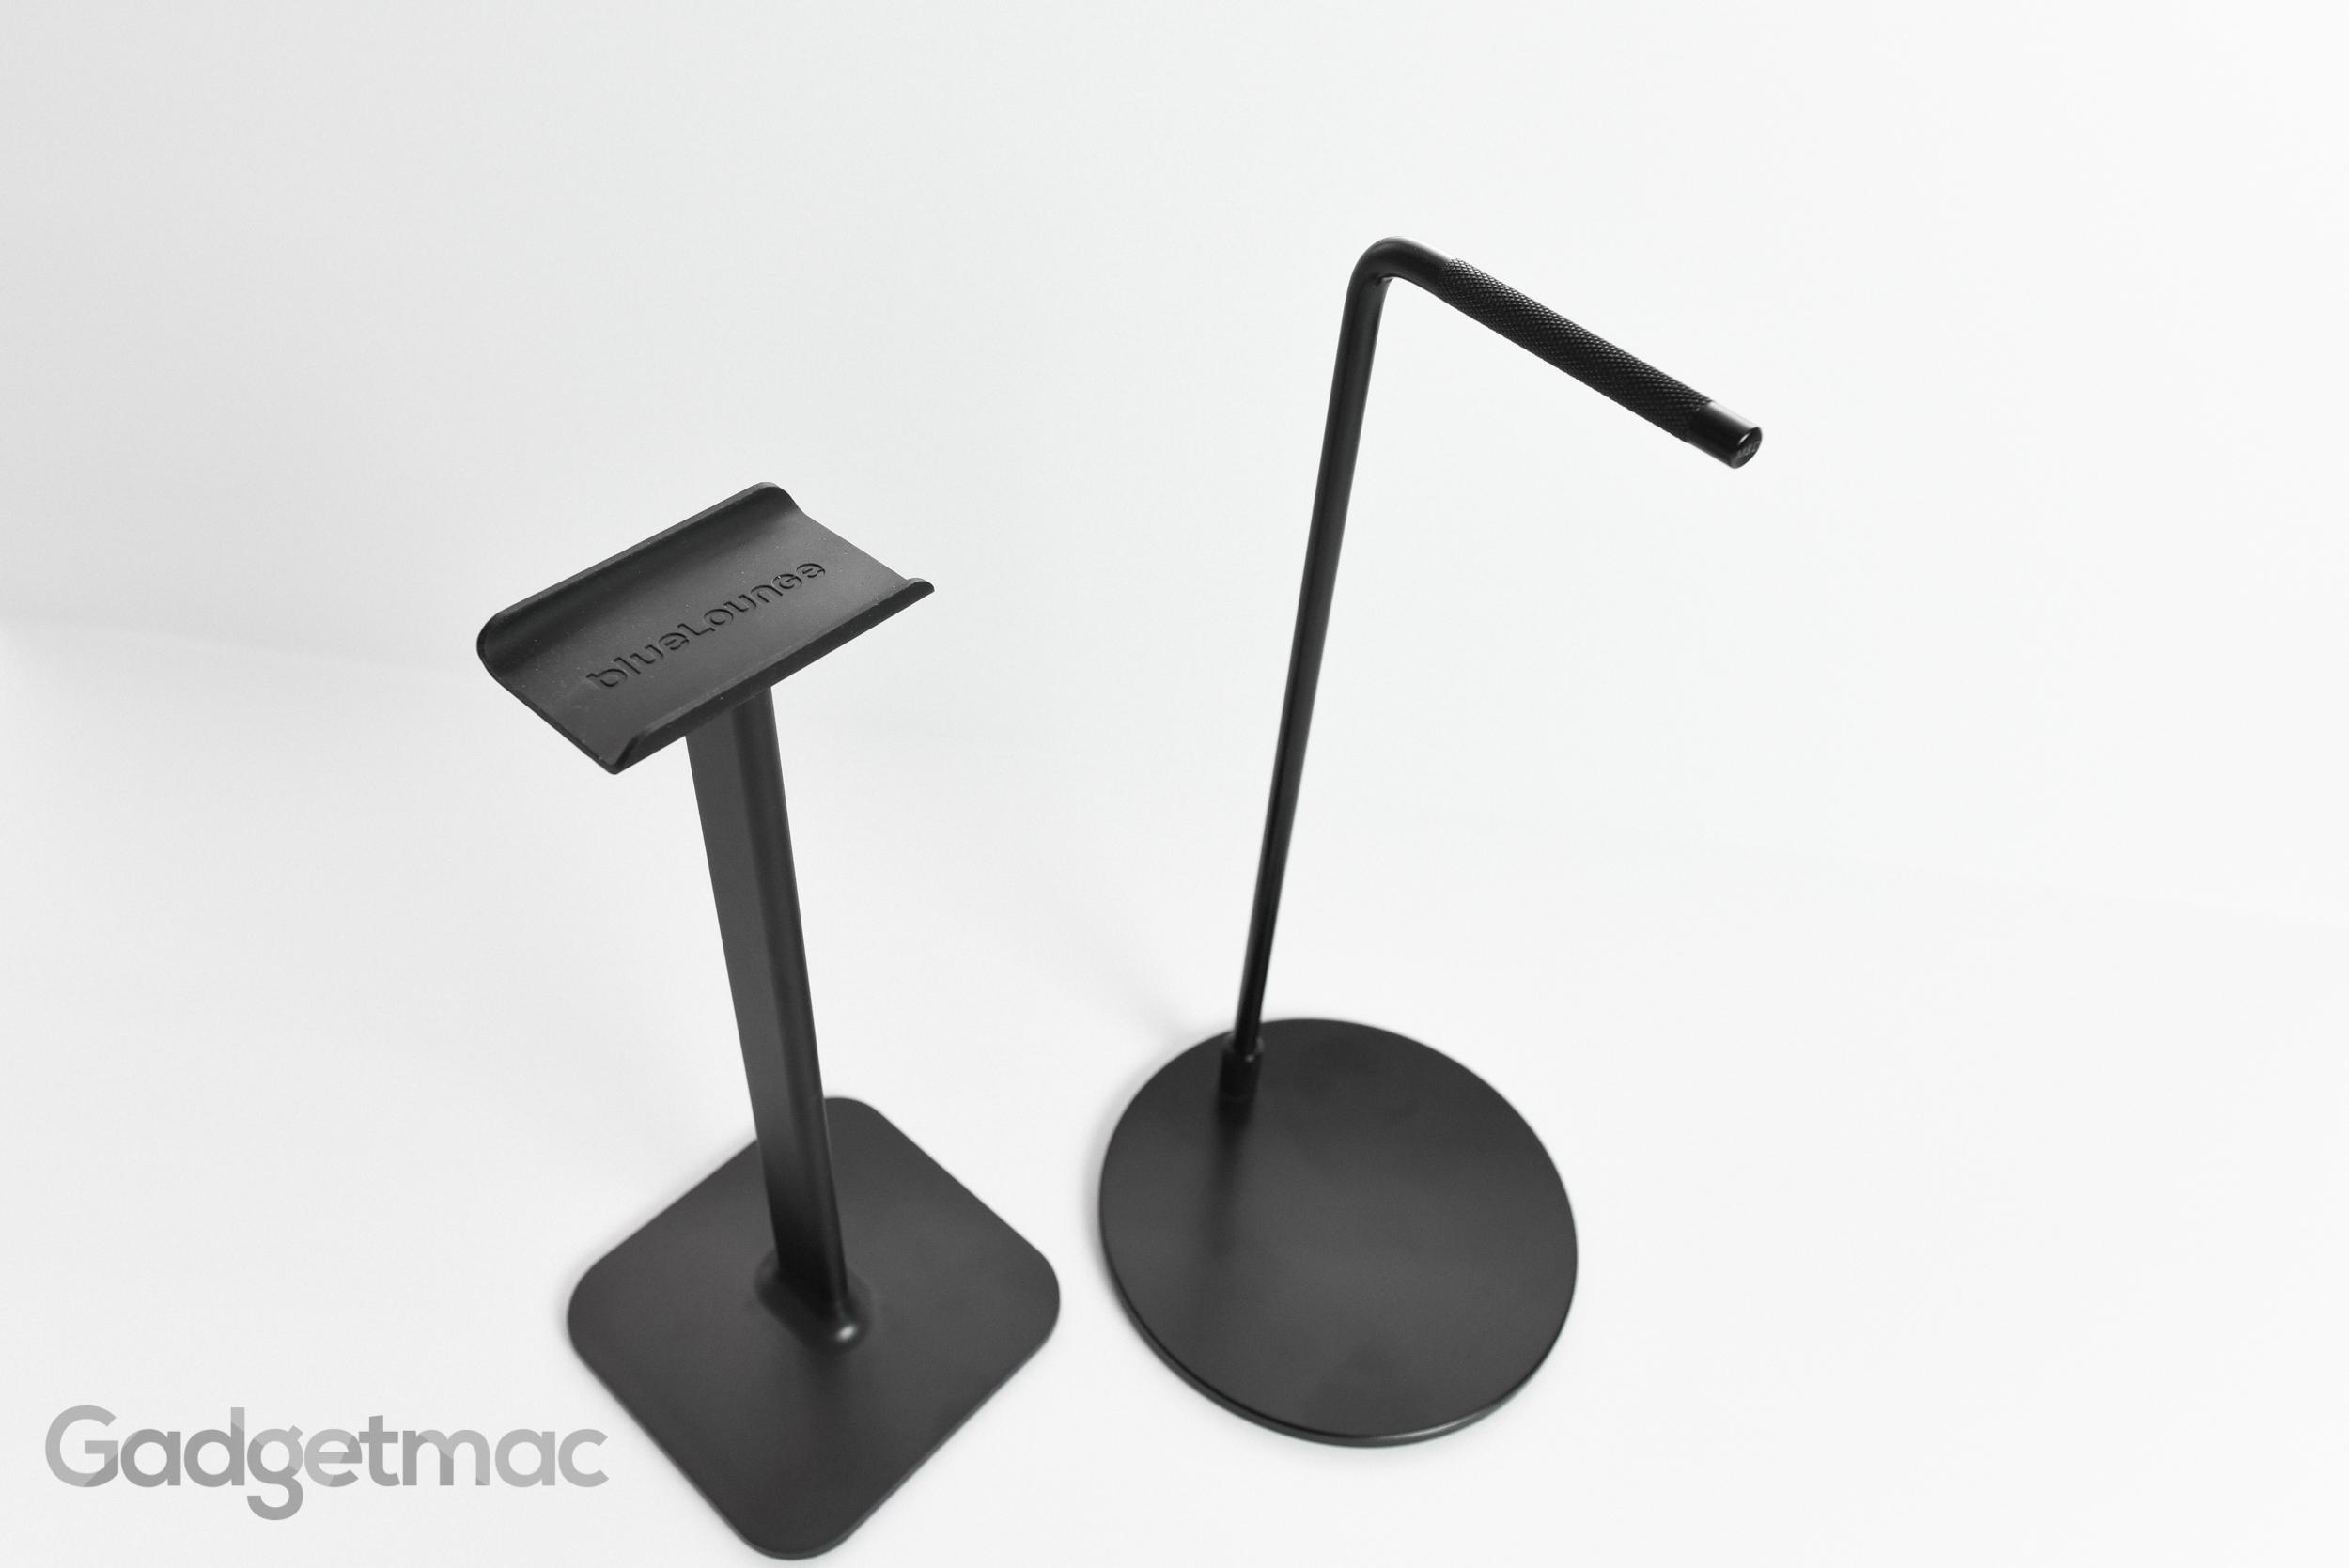 bluelounge_posto_headphone_stand_vs_master_dynamic_metal_stand.jpg